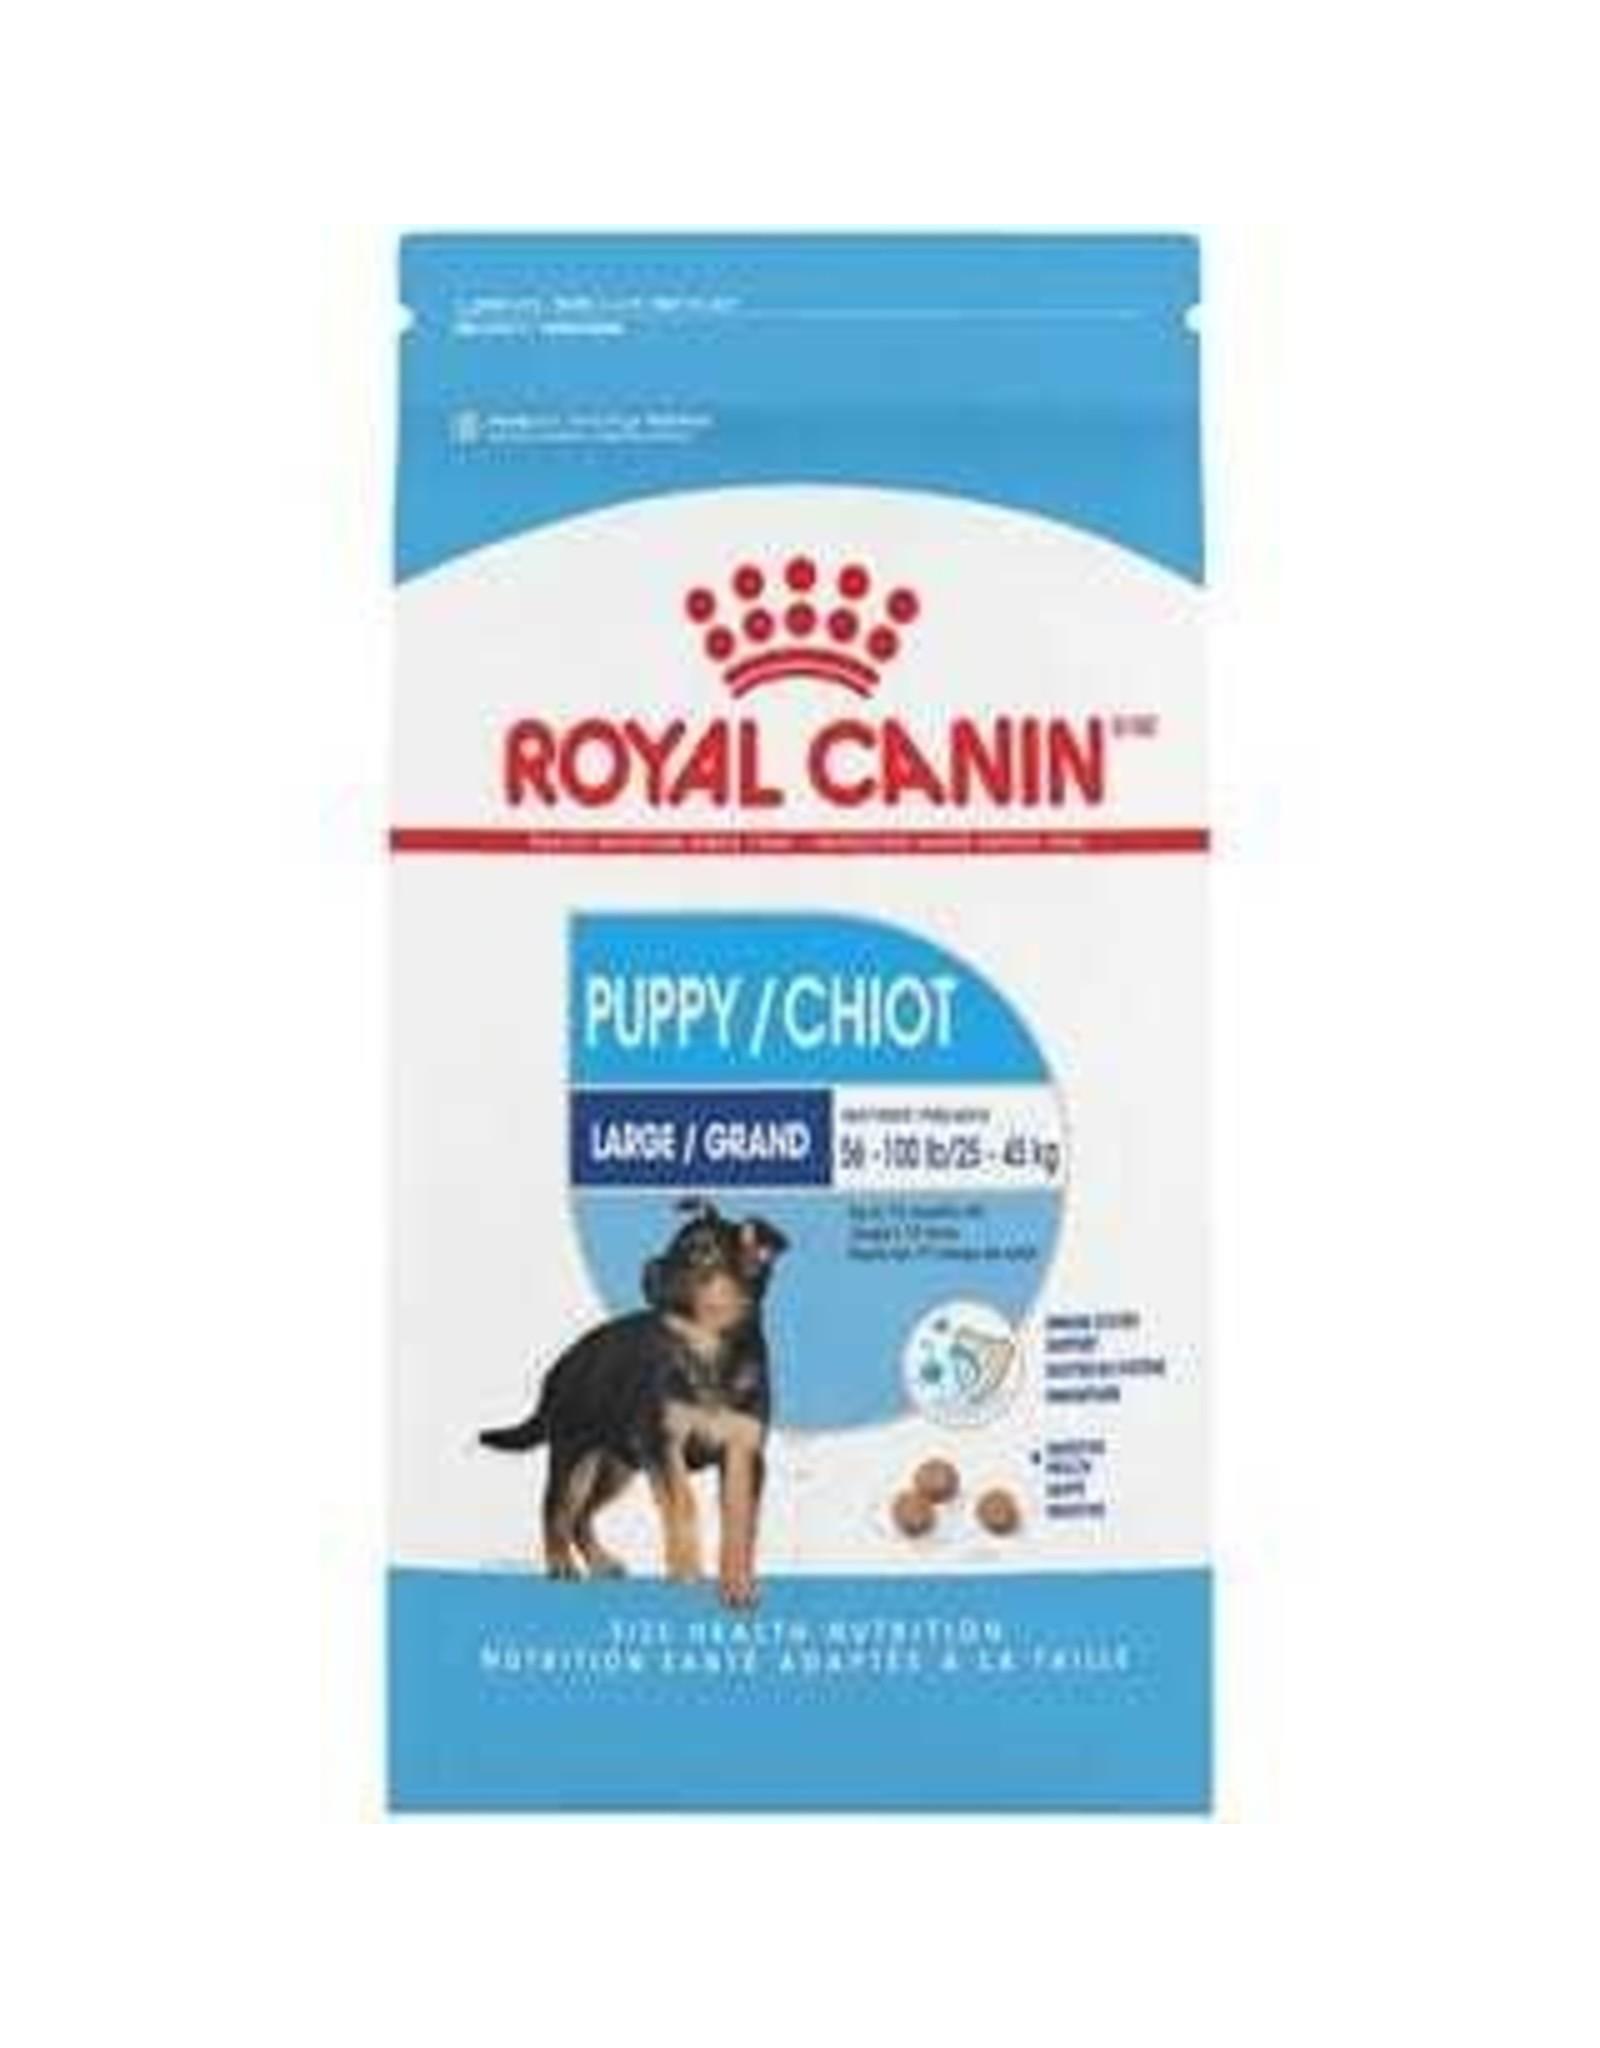 Royal Canin Royal Canin Dog - Large Puppy 6lb